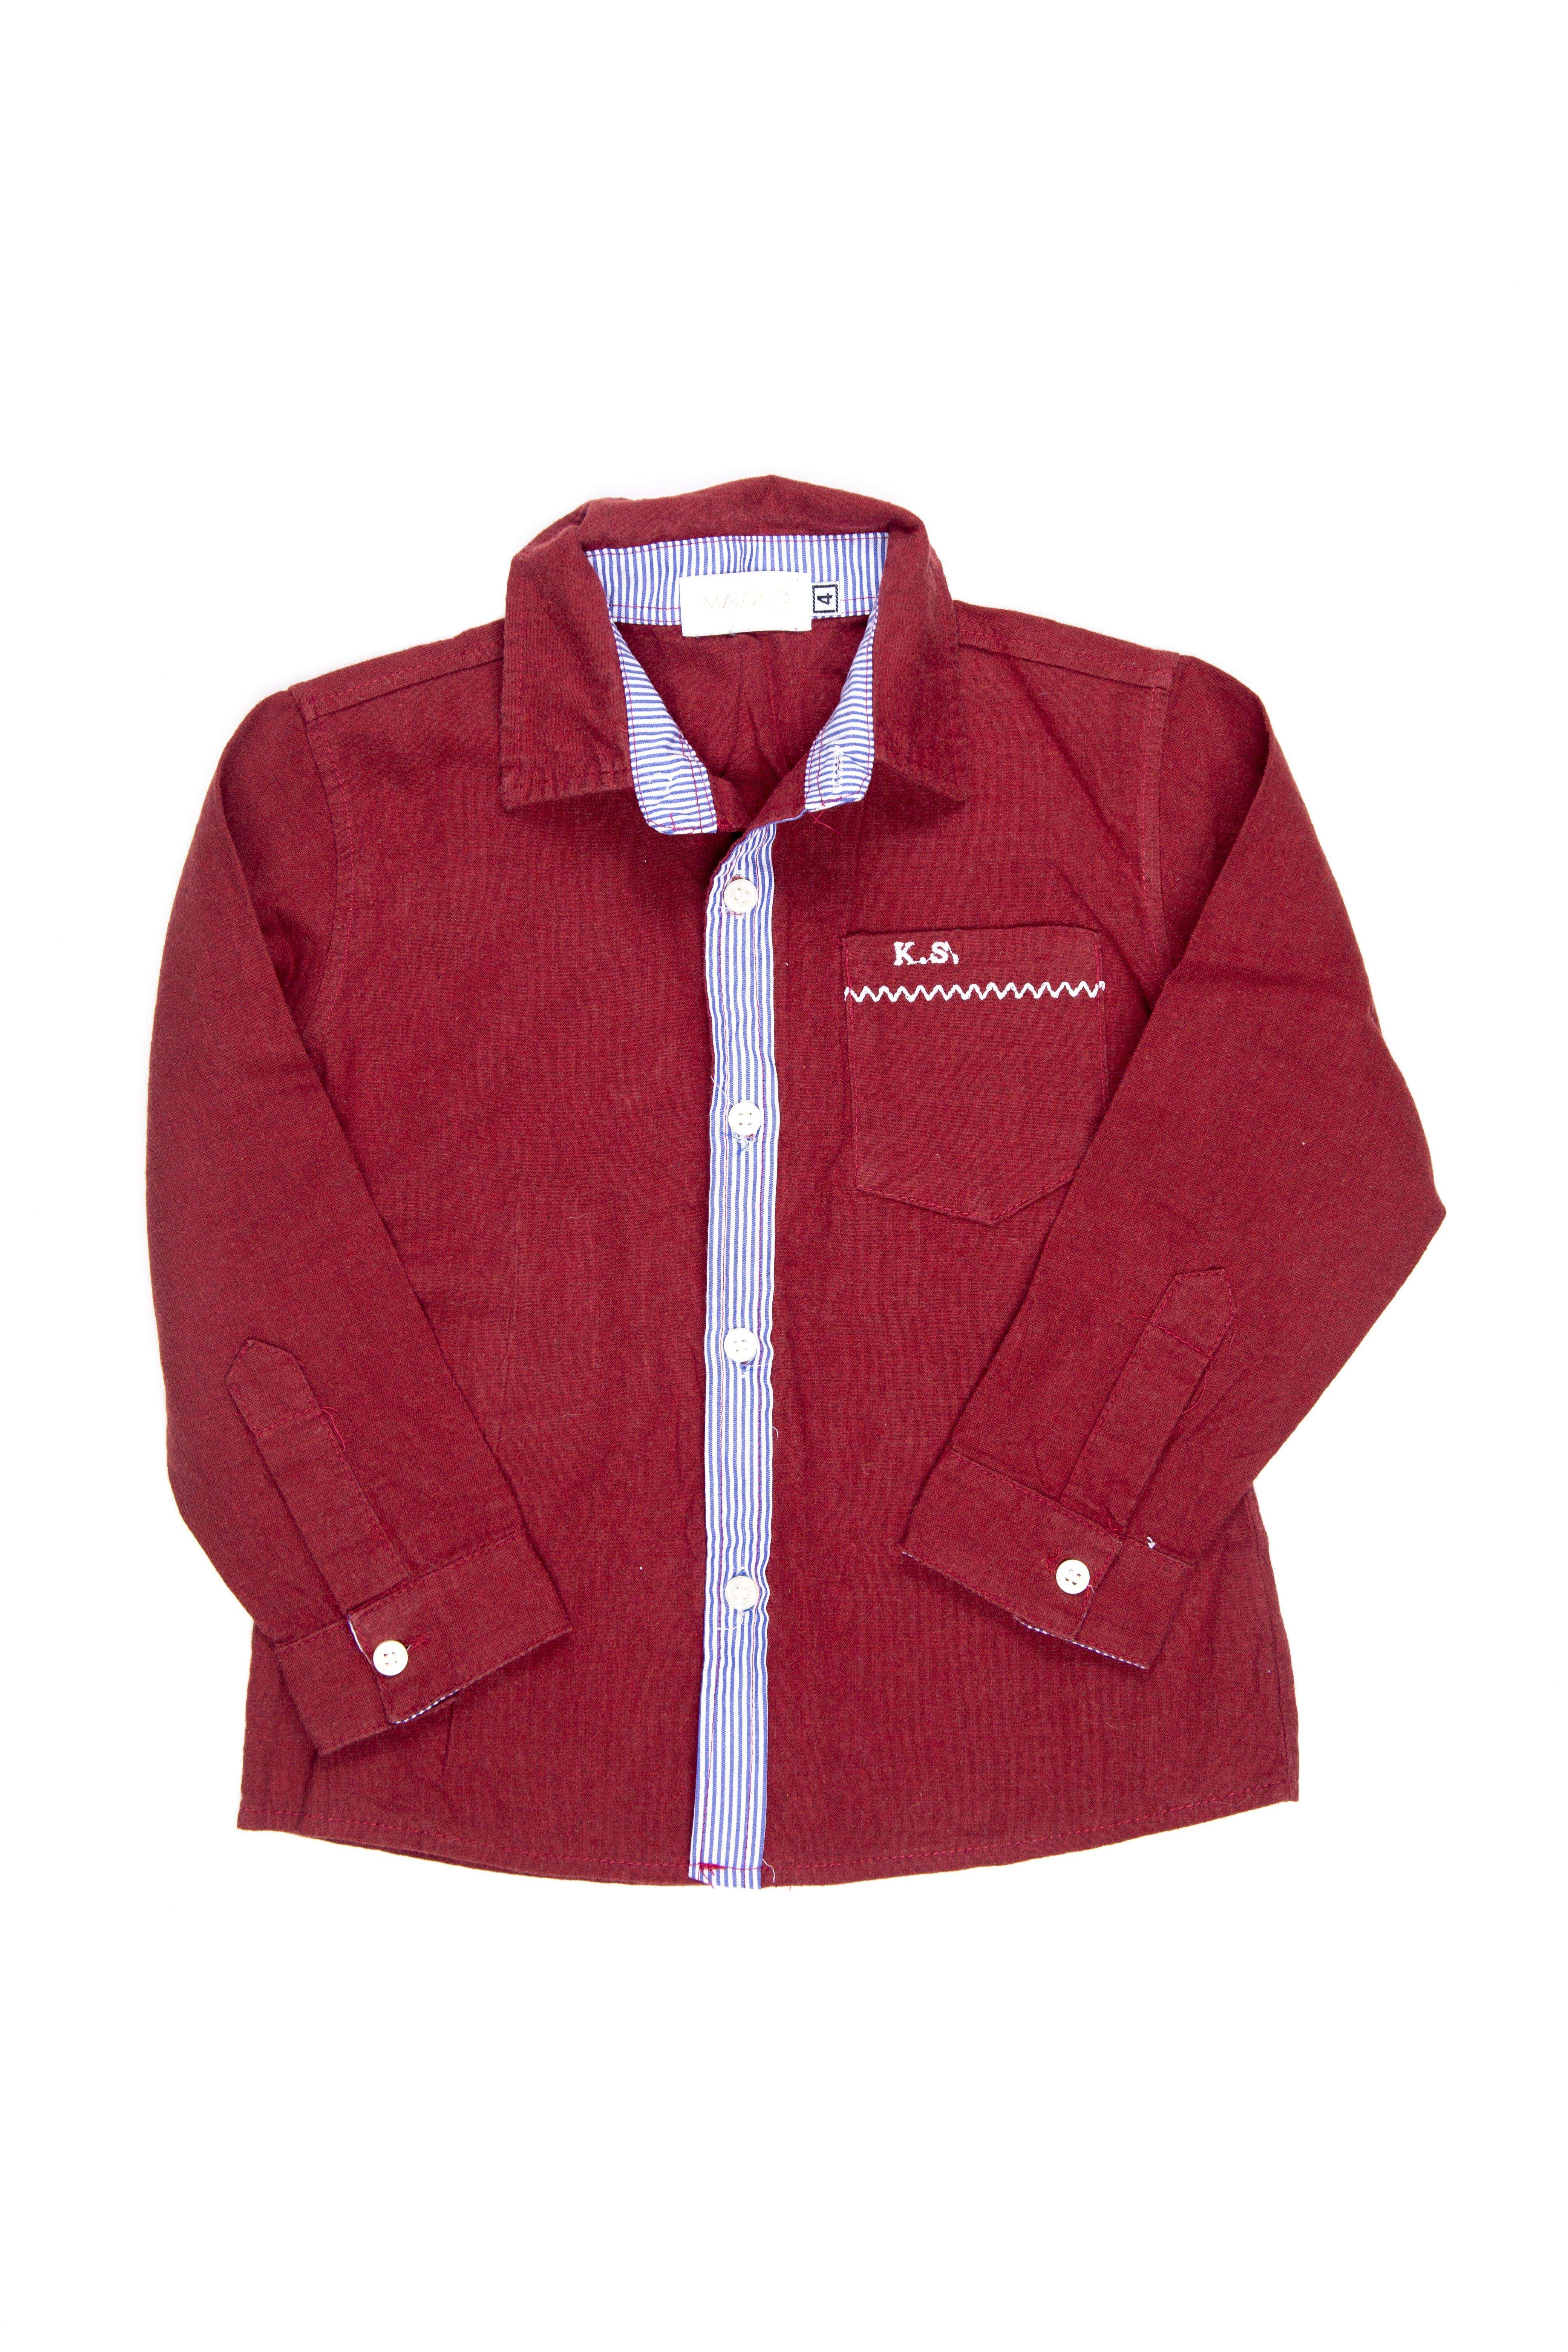 camisa guinda 100% algodón - maloko kids